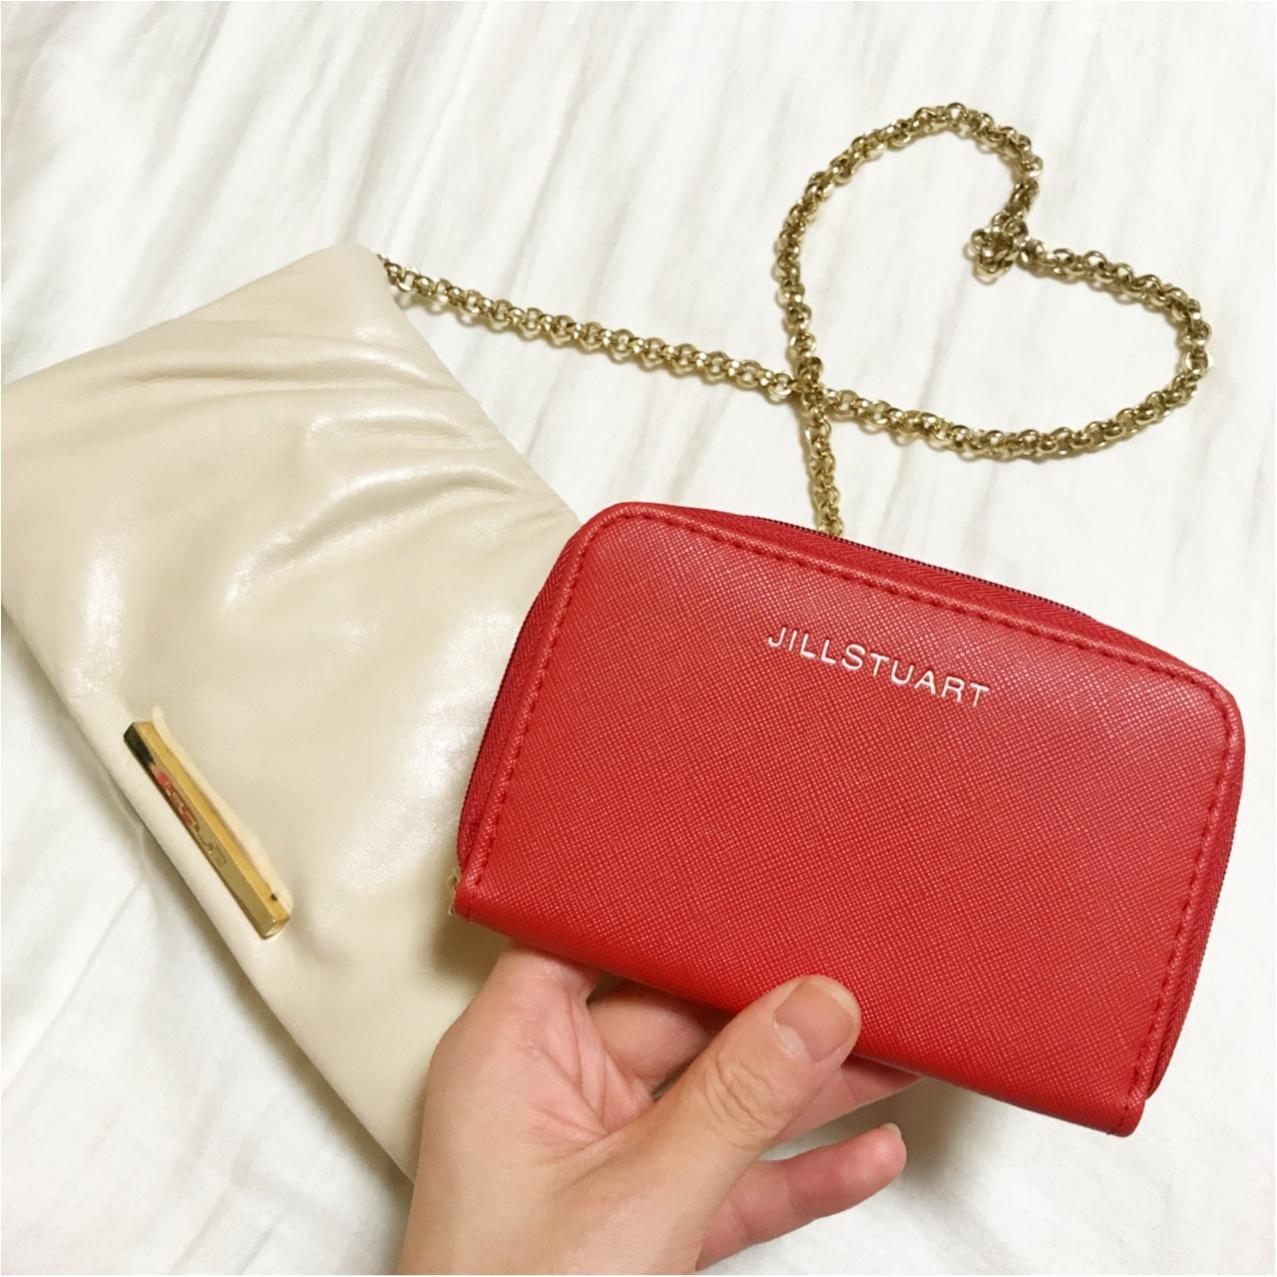 MORE12月号付録【JILLSTUART レザー調レディなミニ財布】が可愛い&使えるっ♡_3